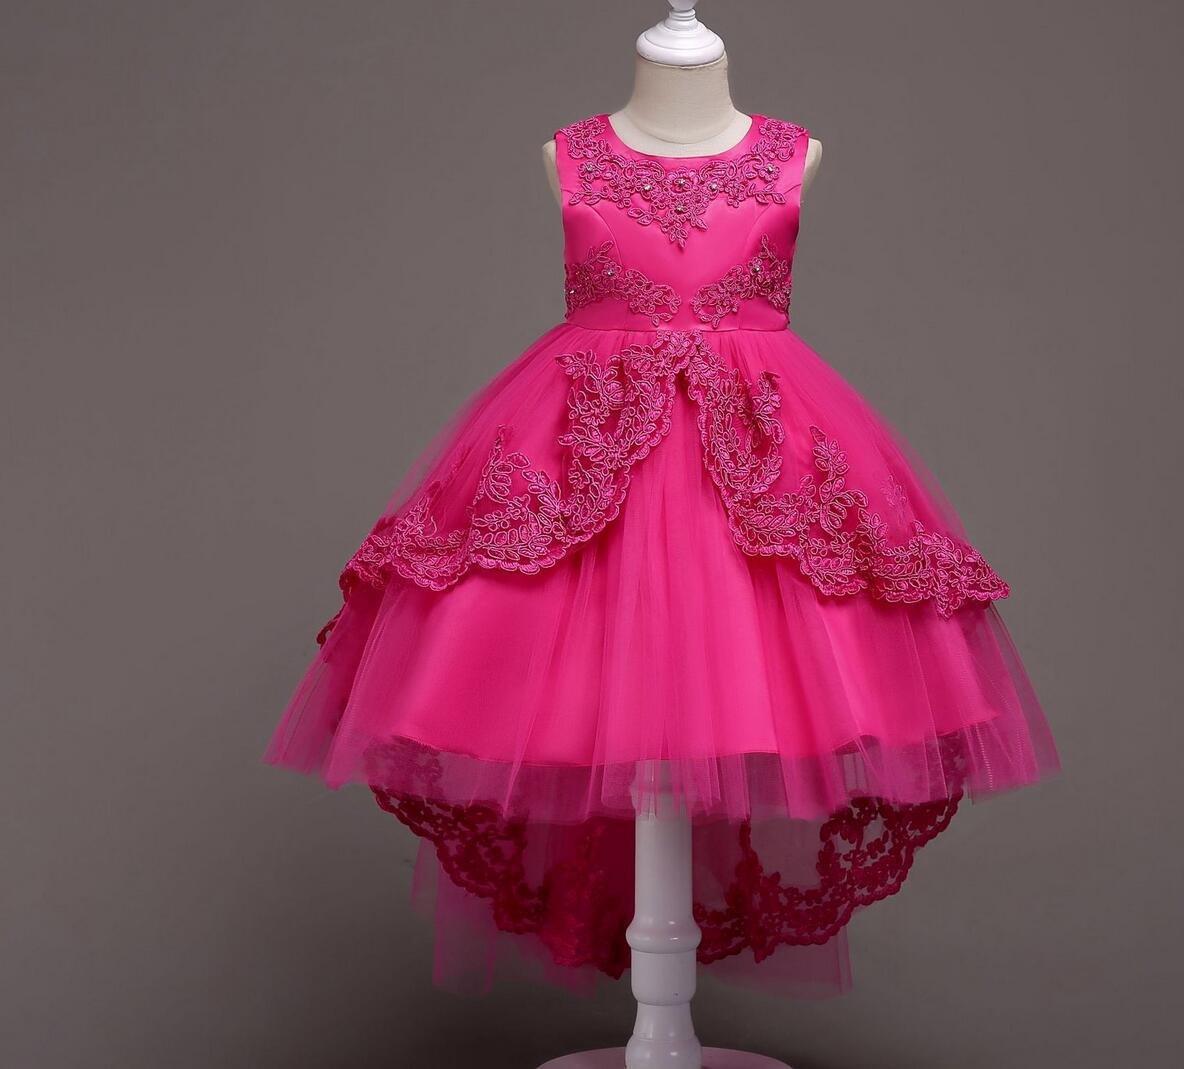 Vestidos para niñ os Vestidos para niñ os Vestidos para niñ os Vestidos para niñ os Vestidos para Damas de Honor, Rose Red, 8 SMACO-Vestidos de niñas